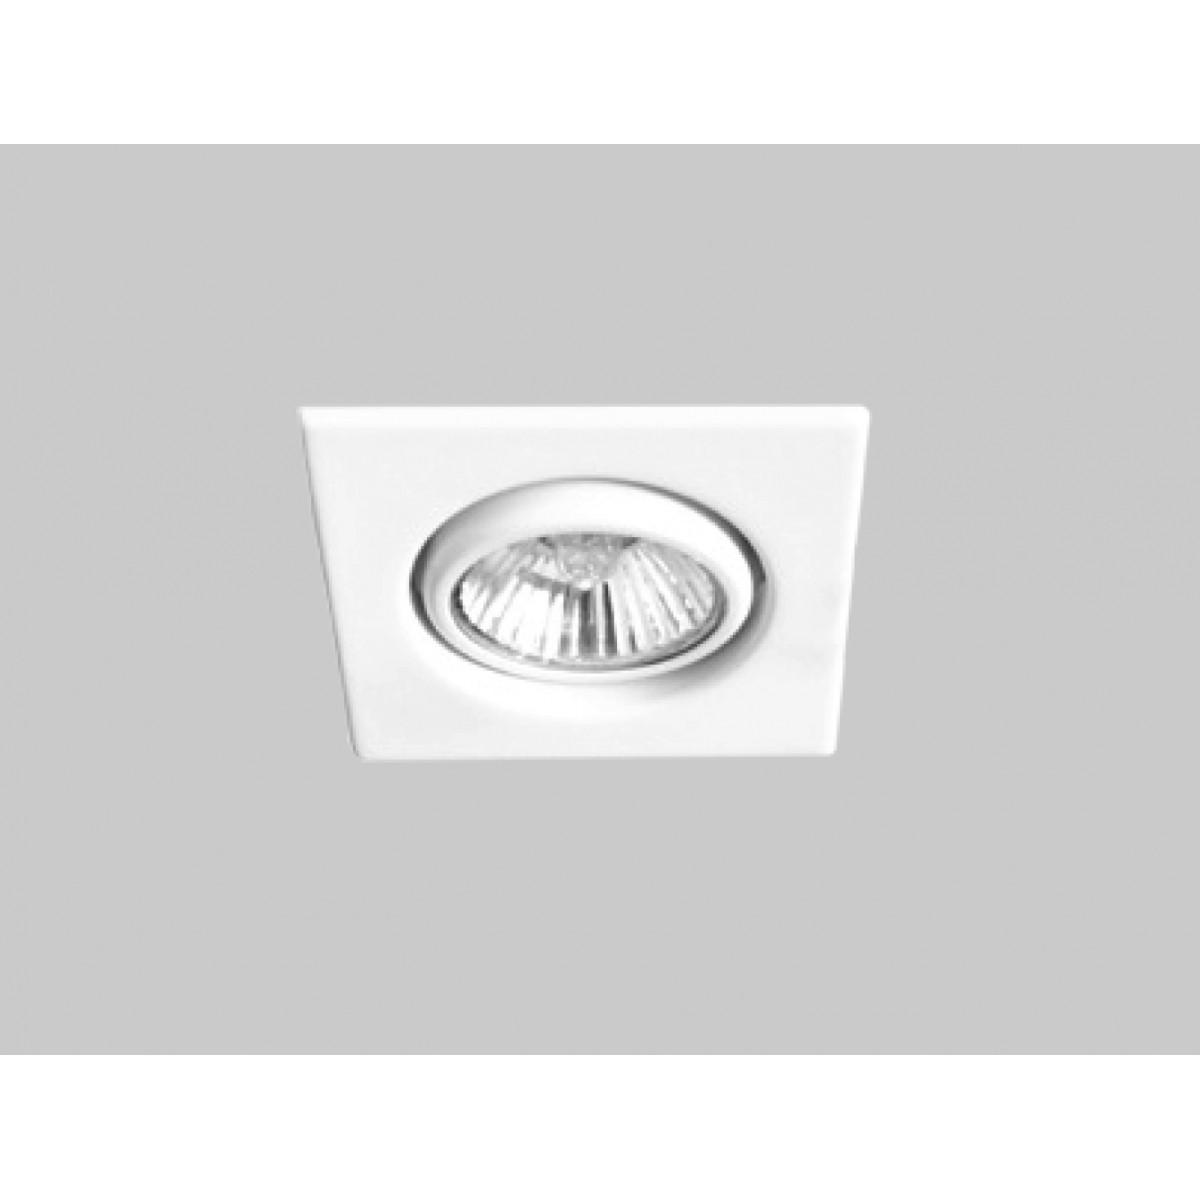 Spot Embutido Quadrado AR111 Branco Pop DL067 Bella